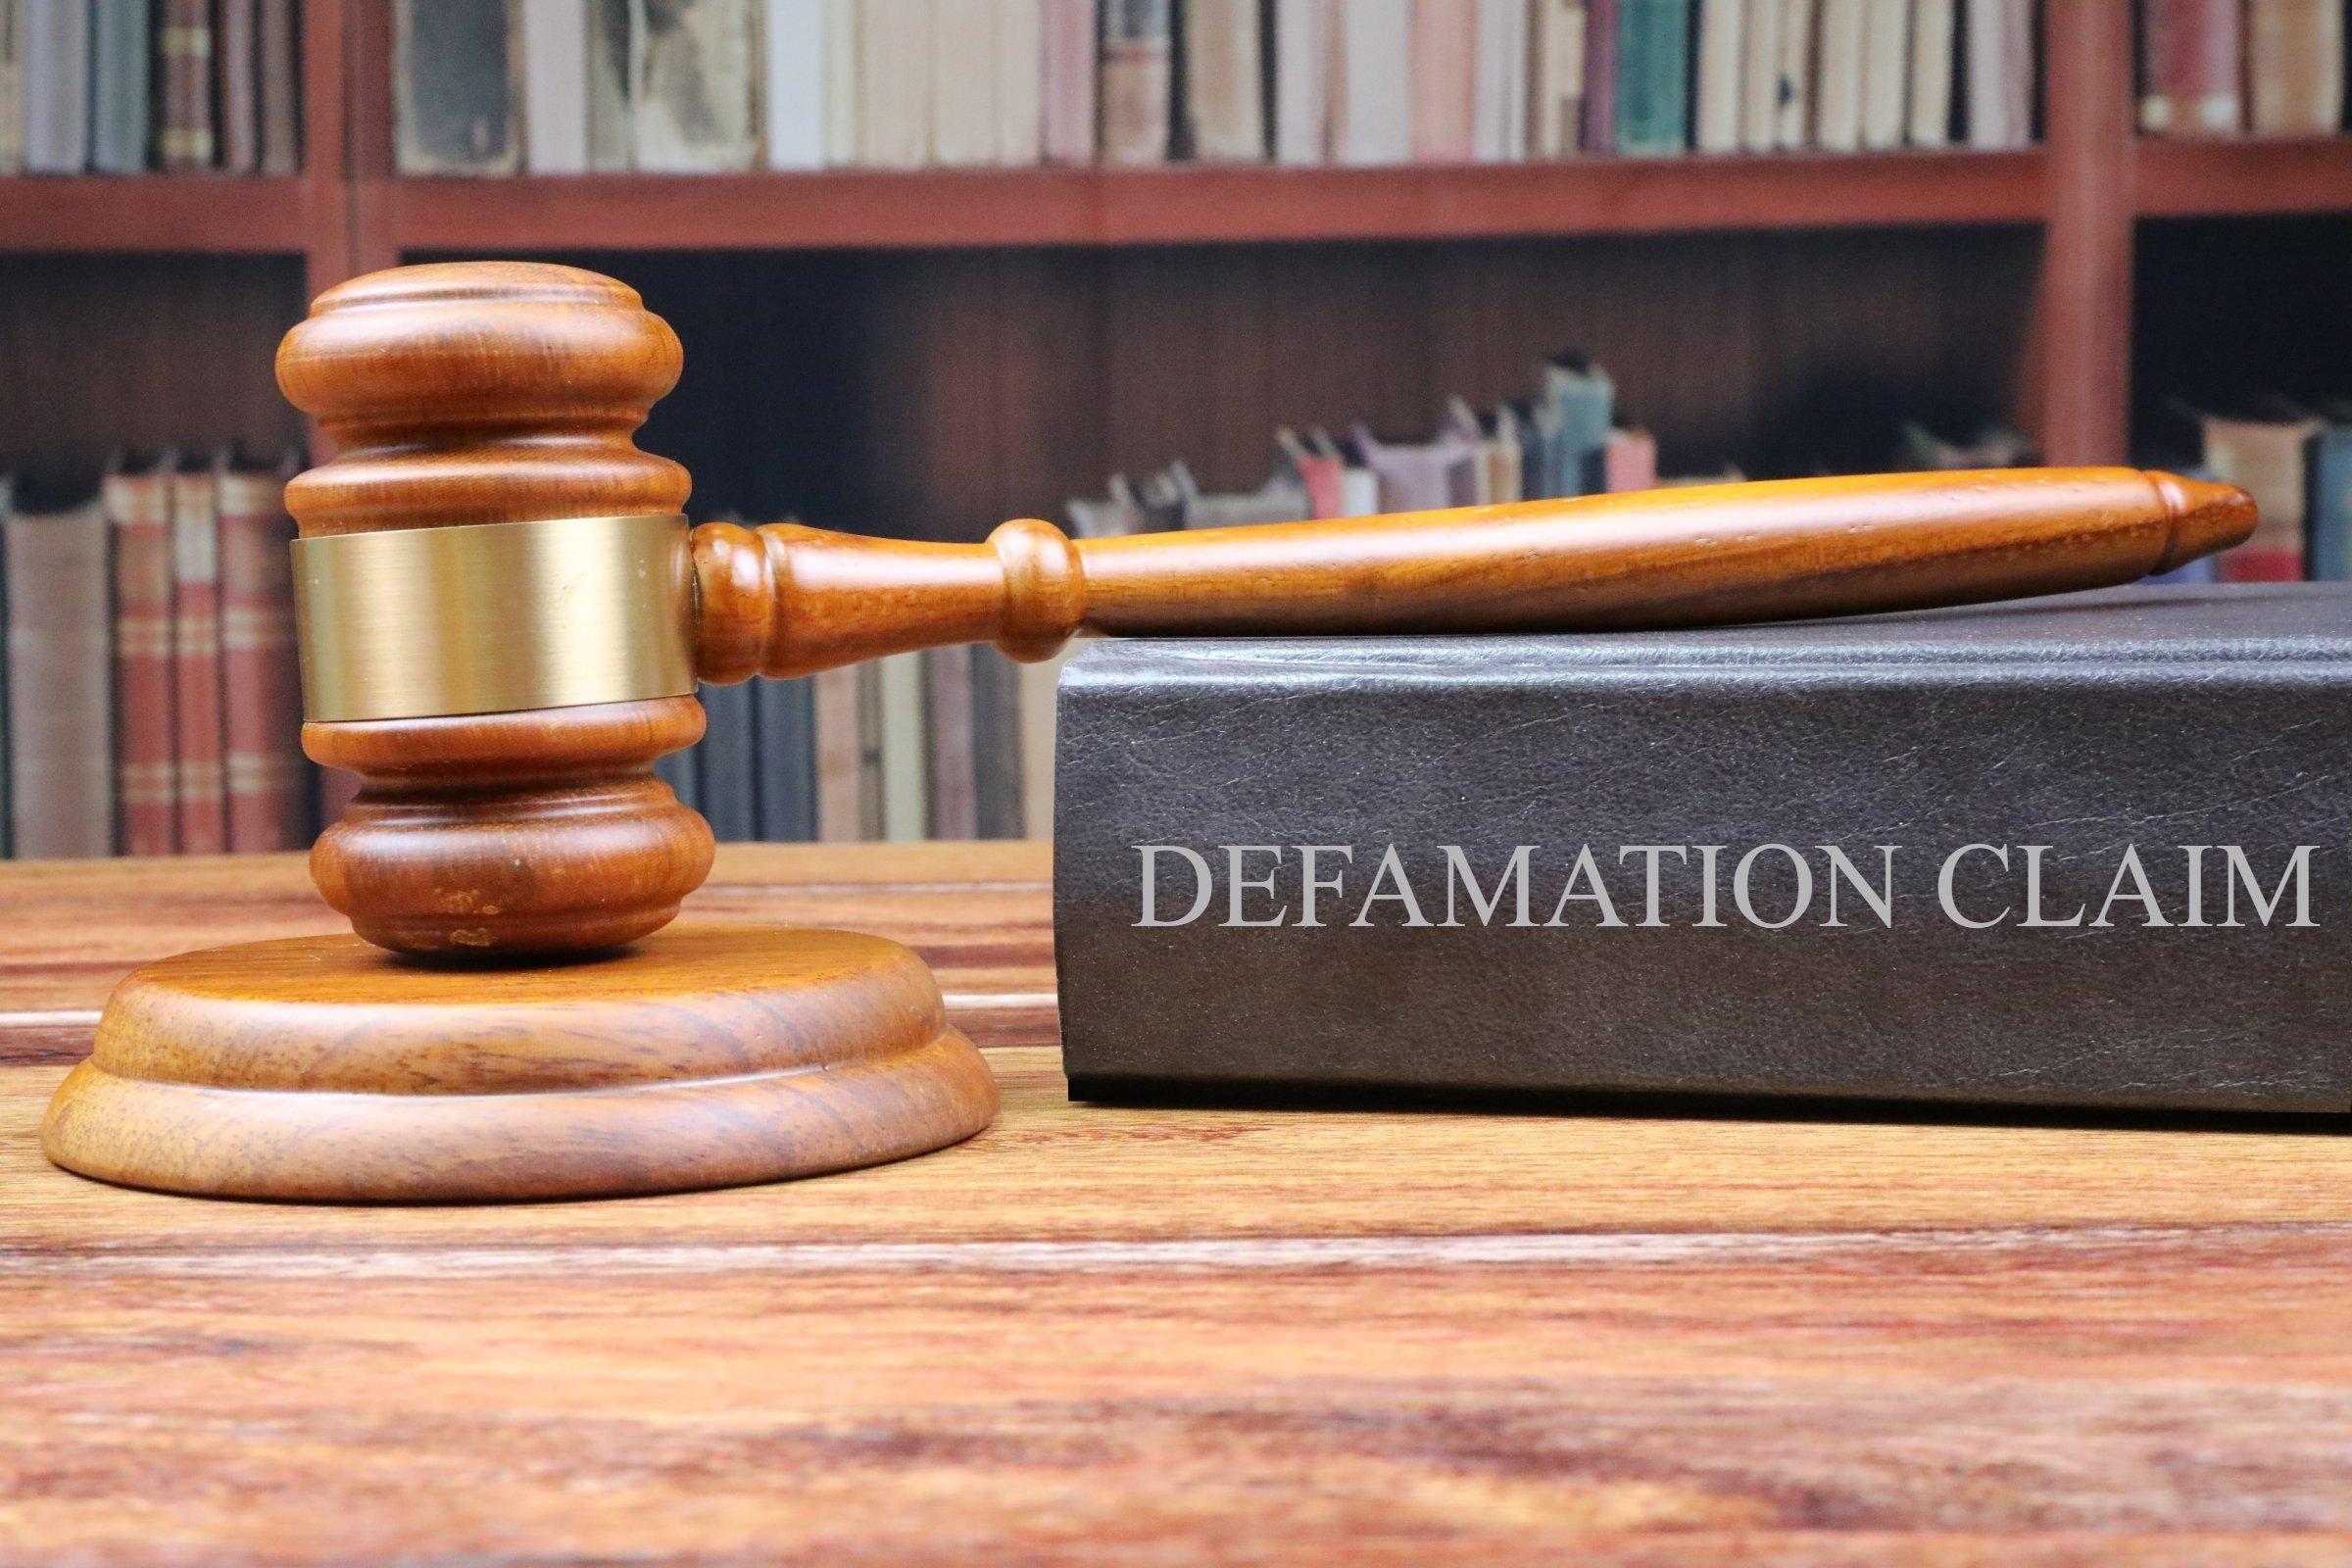 Defamation Claim